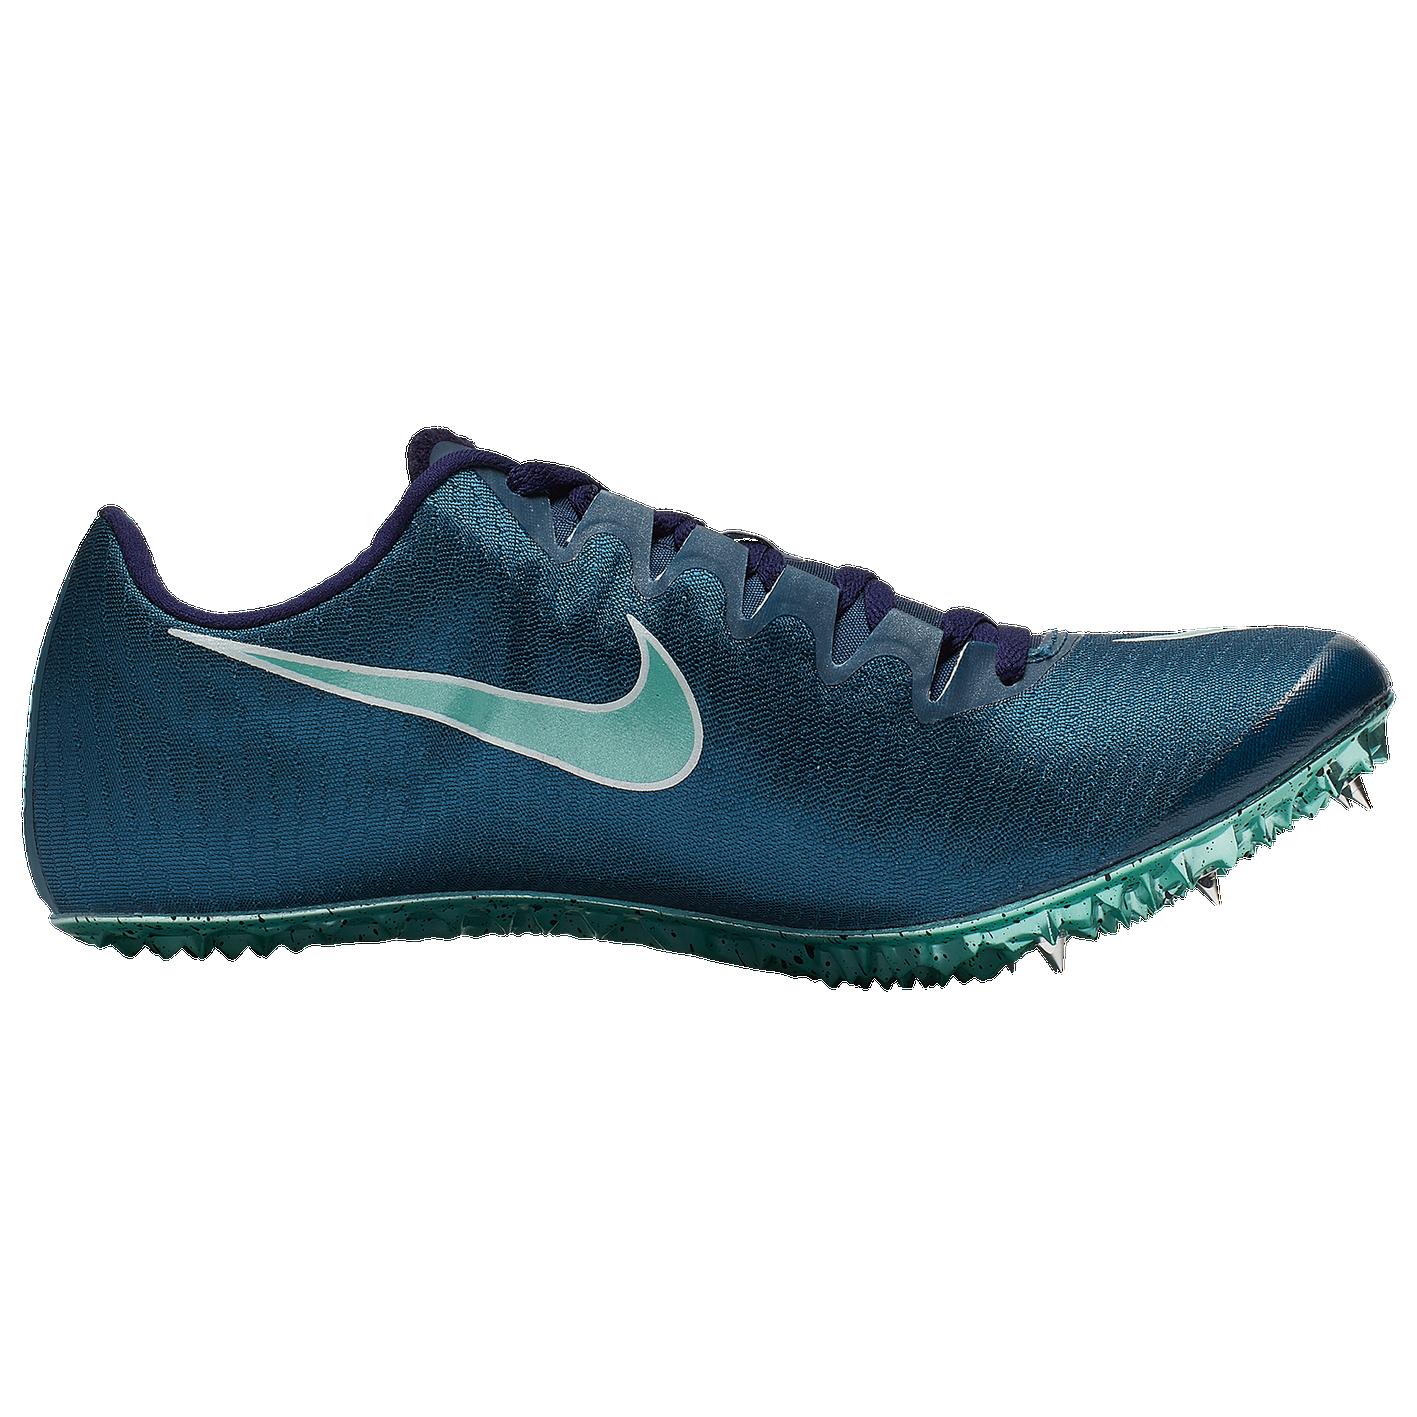 b7df865e8 Nike Zoom Superfly Elite - Men s - Track   Field - Shoes - Blue ...